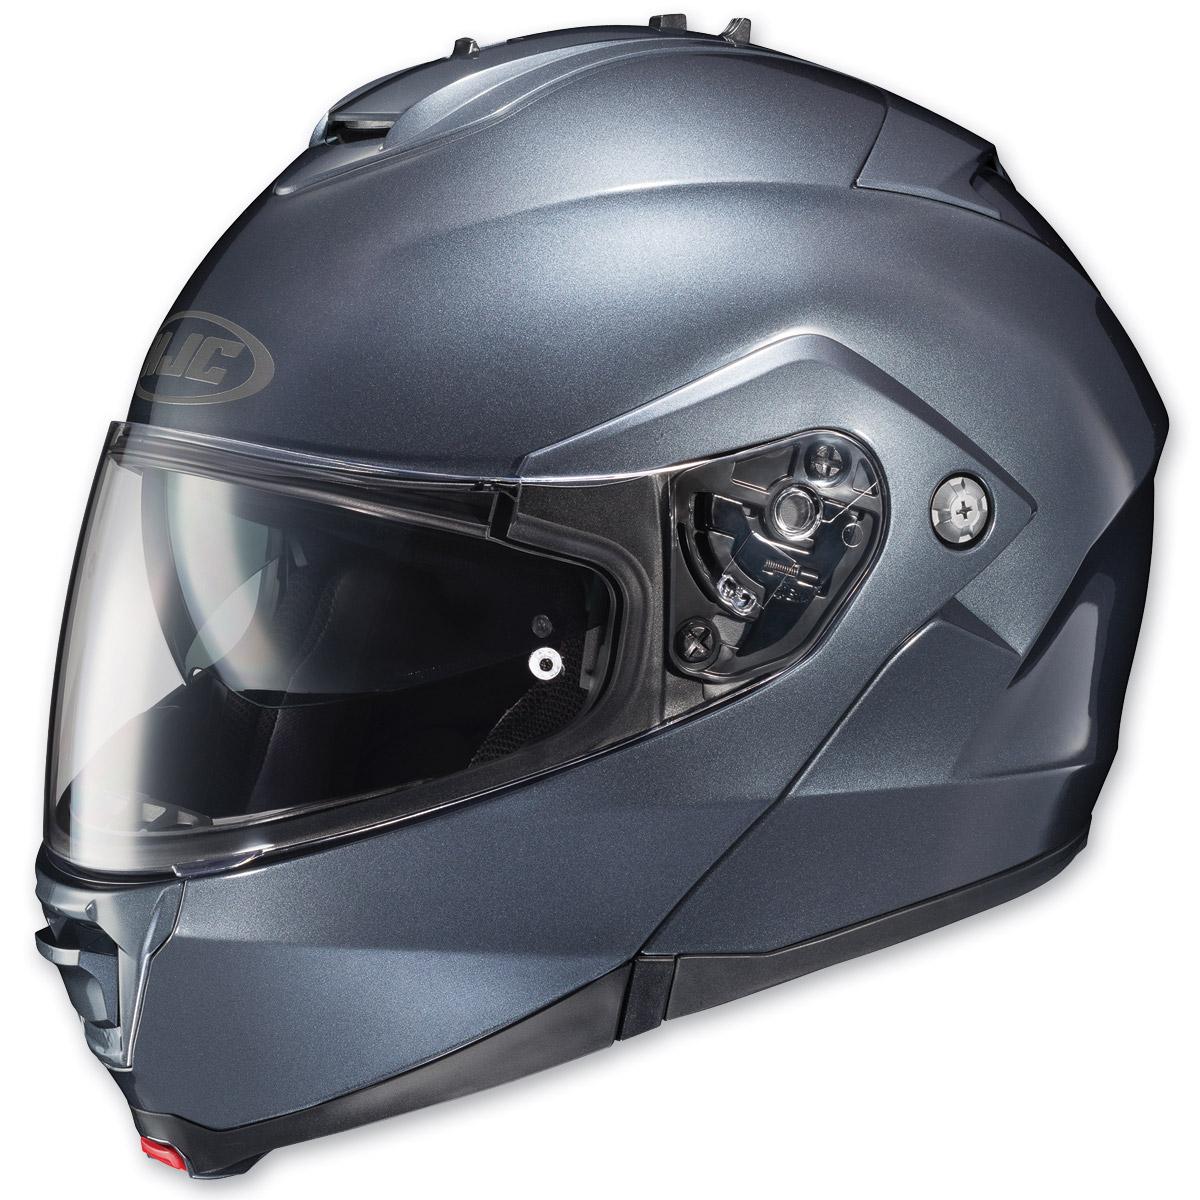 HJC IS-MAX II Anthracite Gray Modular Helmet